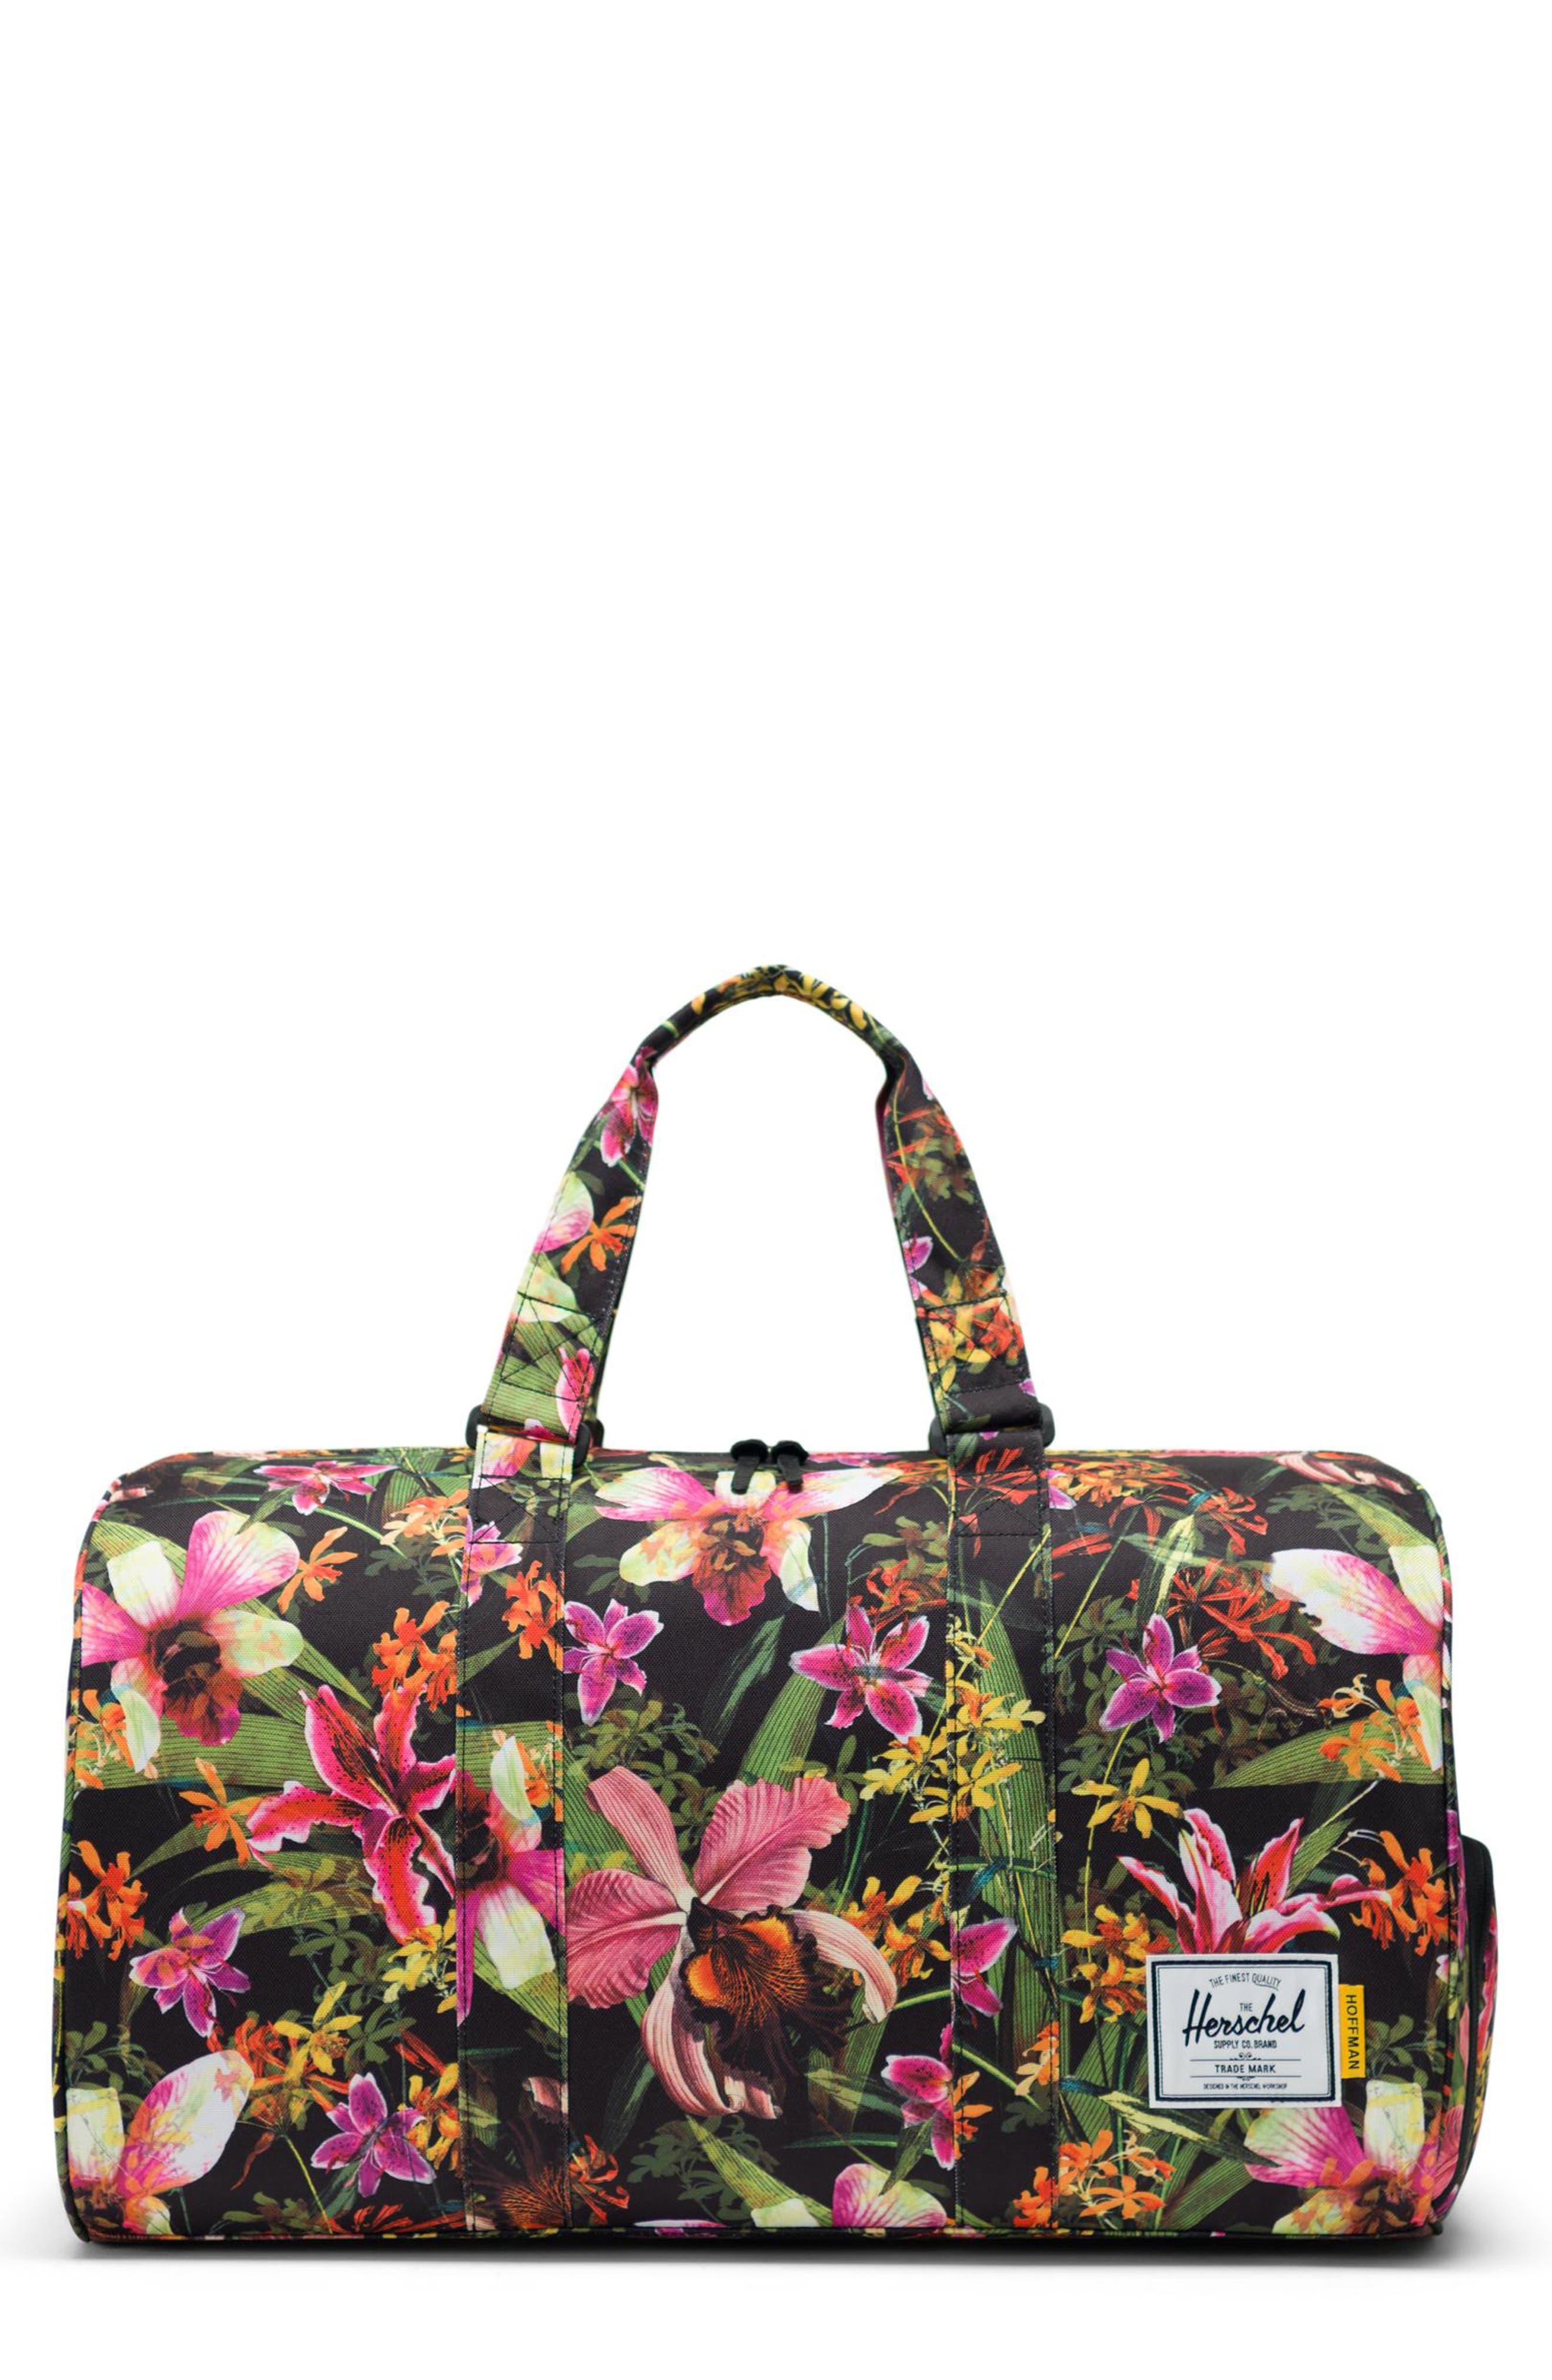 HERSCHEL SUPPLY CO. Novel Duffle Bag, Main, color, JUNGLE HOFFMAN